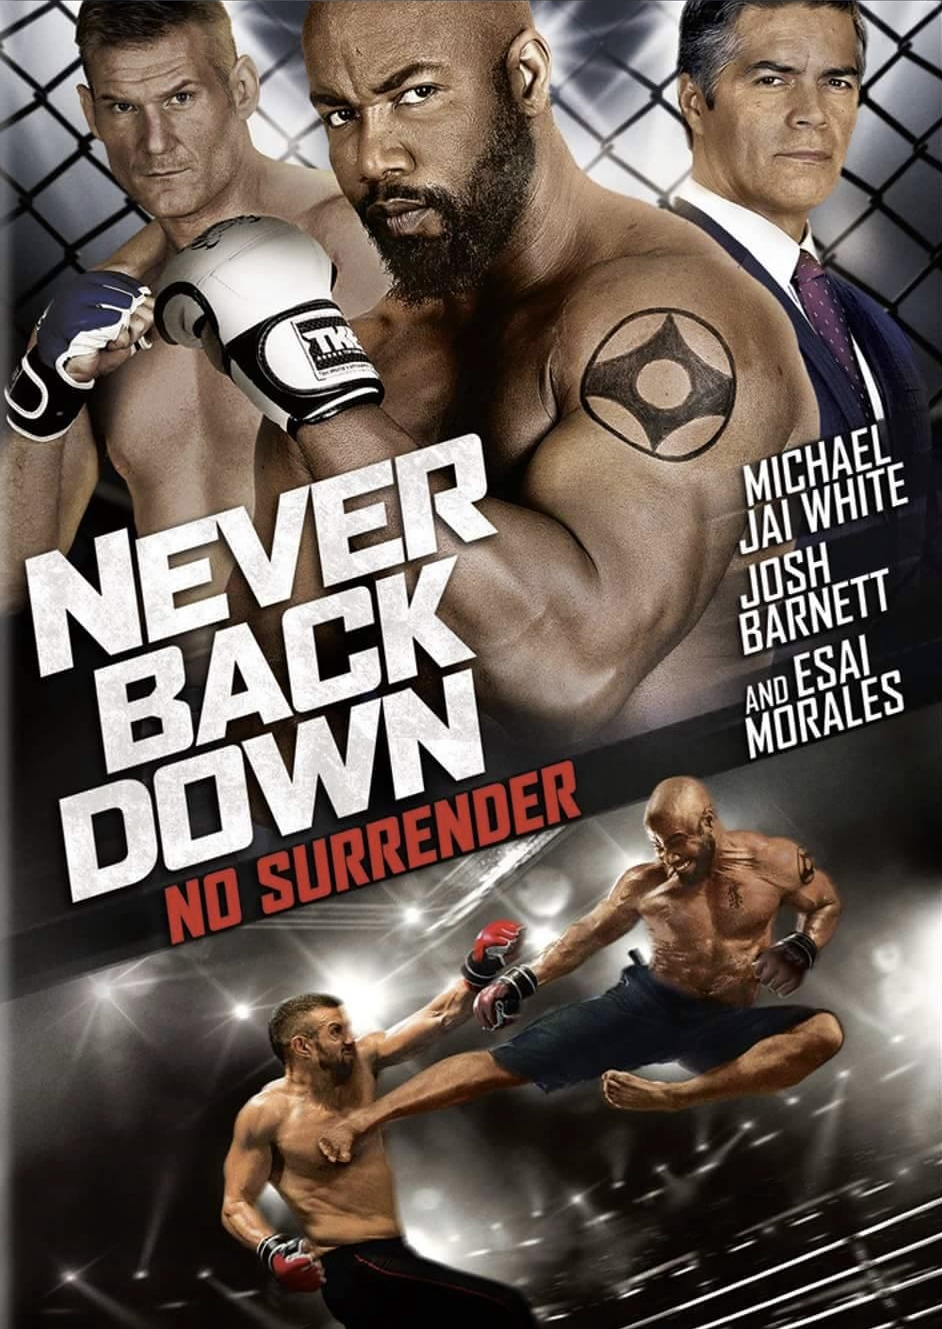 Download film never back down 1